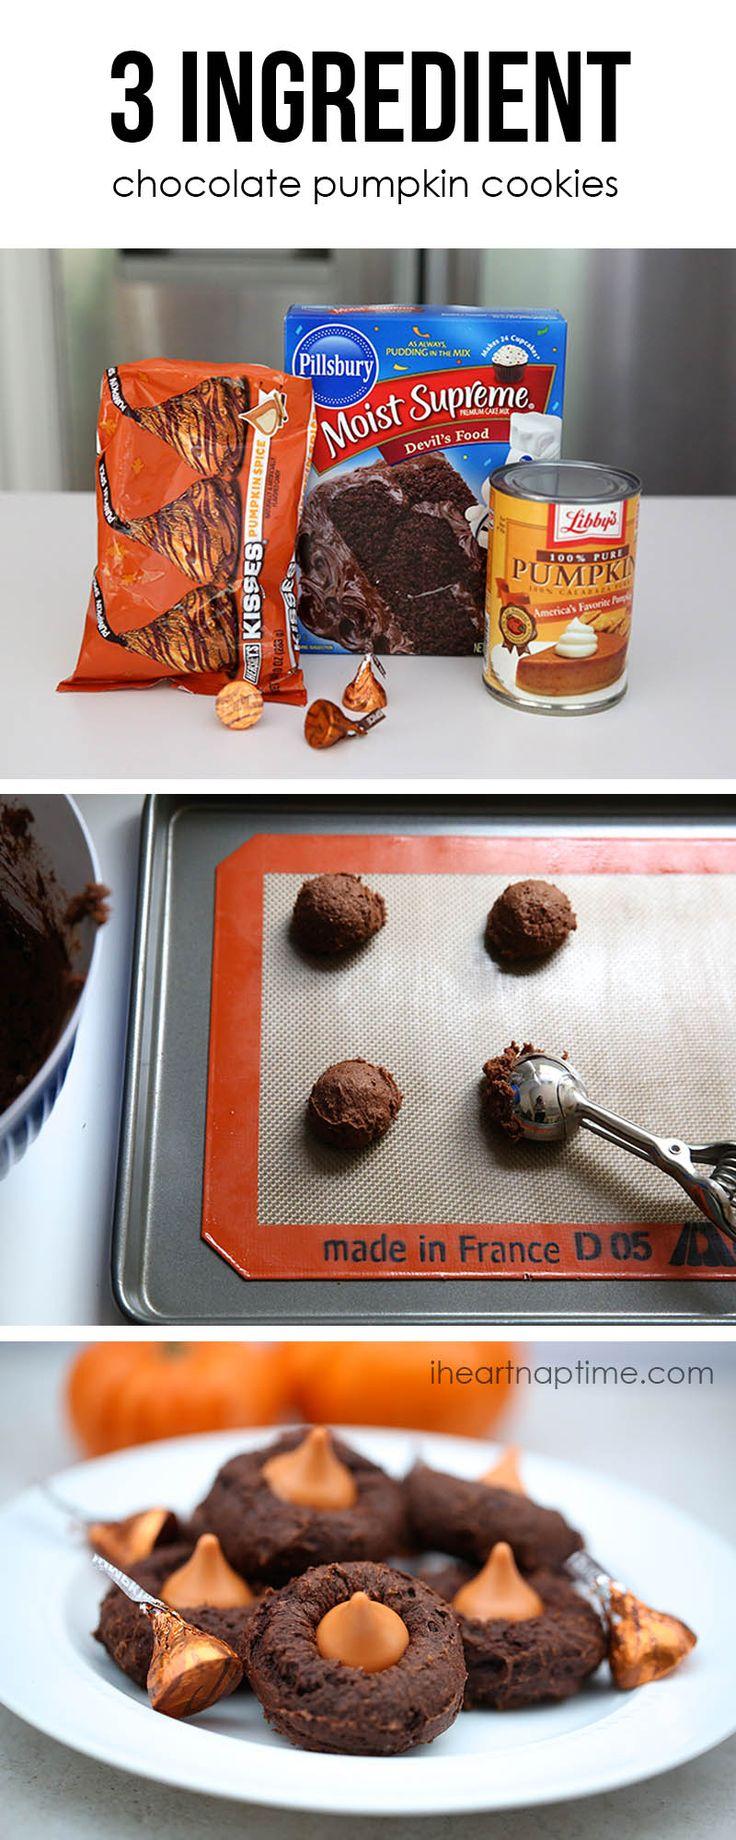 3 ingredient chocolate pumpkin cookies